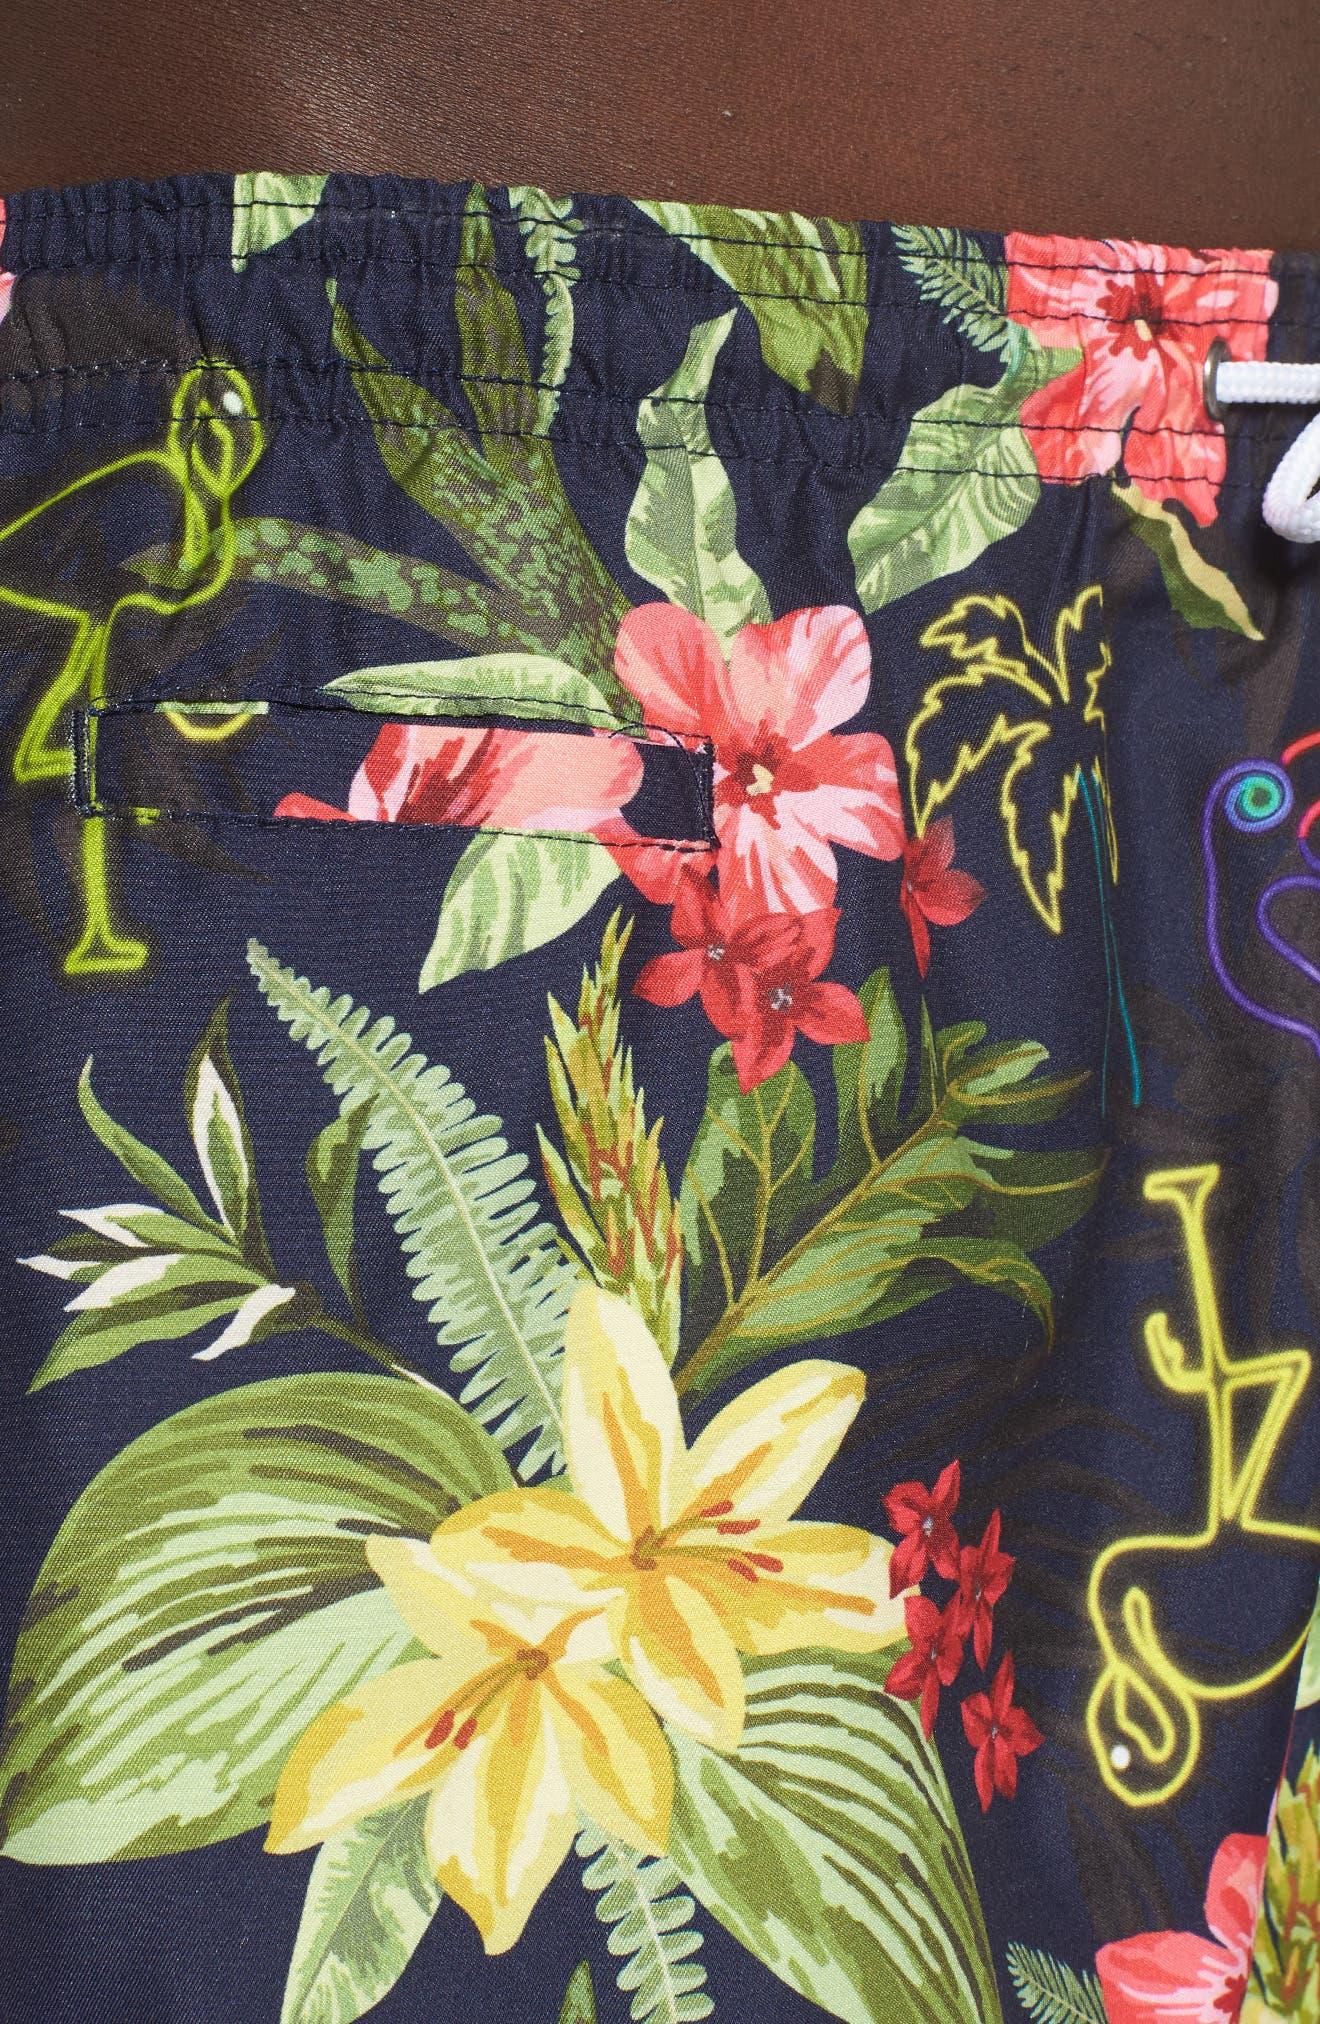 Sano Print Swim Trunks,                             Alternate thumbnail 4, color,                             NEON HAWAIIAN